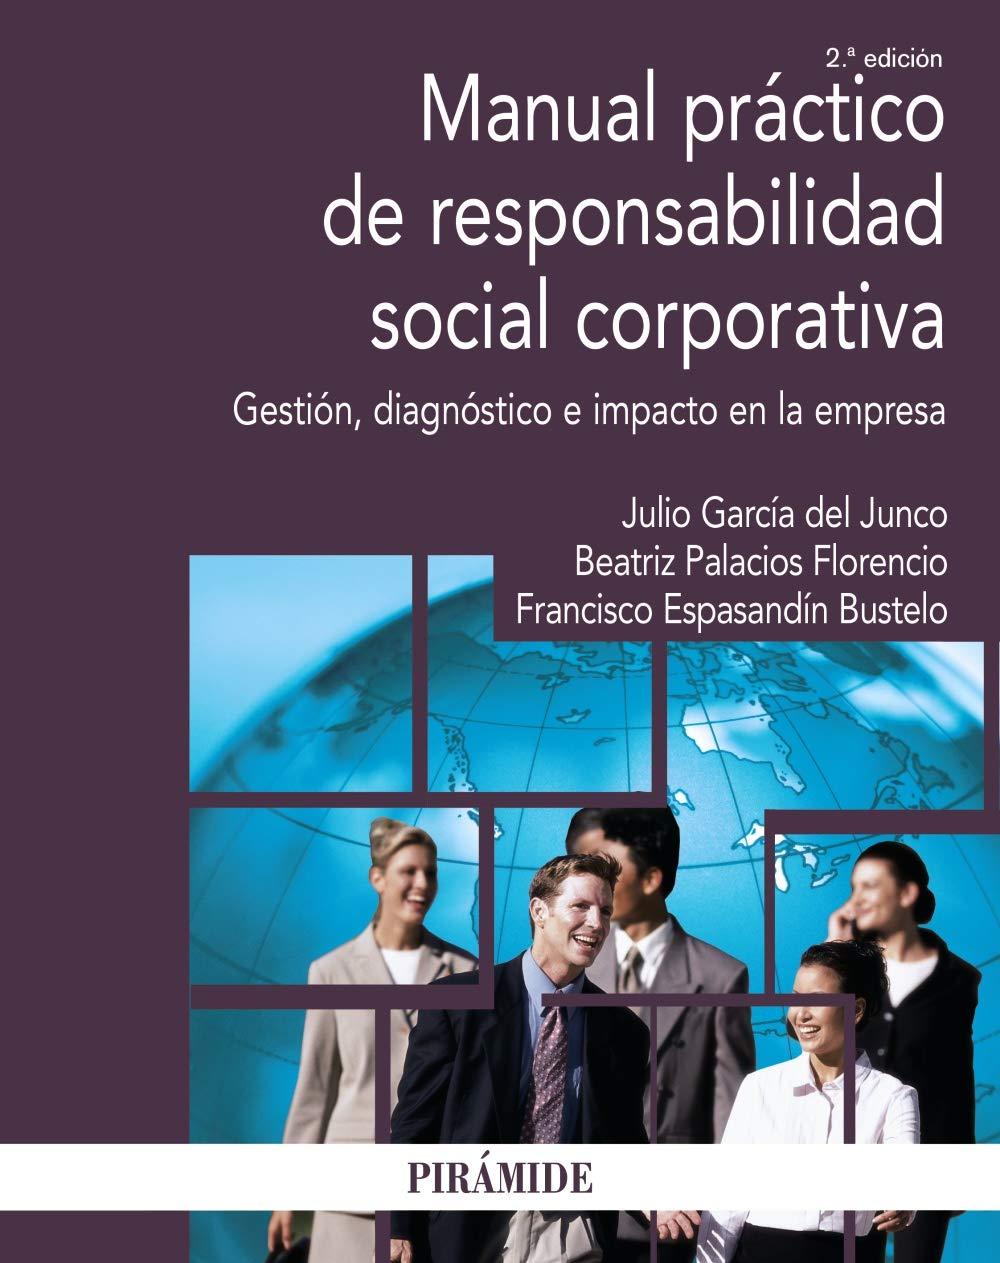 Manual pr?ctico de responsabilidad social corporativa: 9788436839975: Books  - Amazon.ca